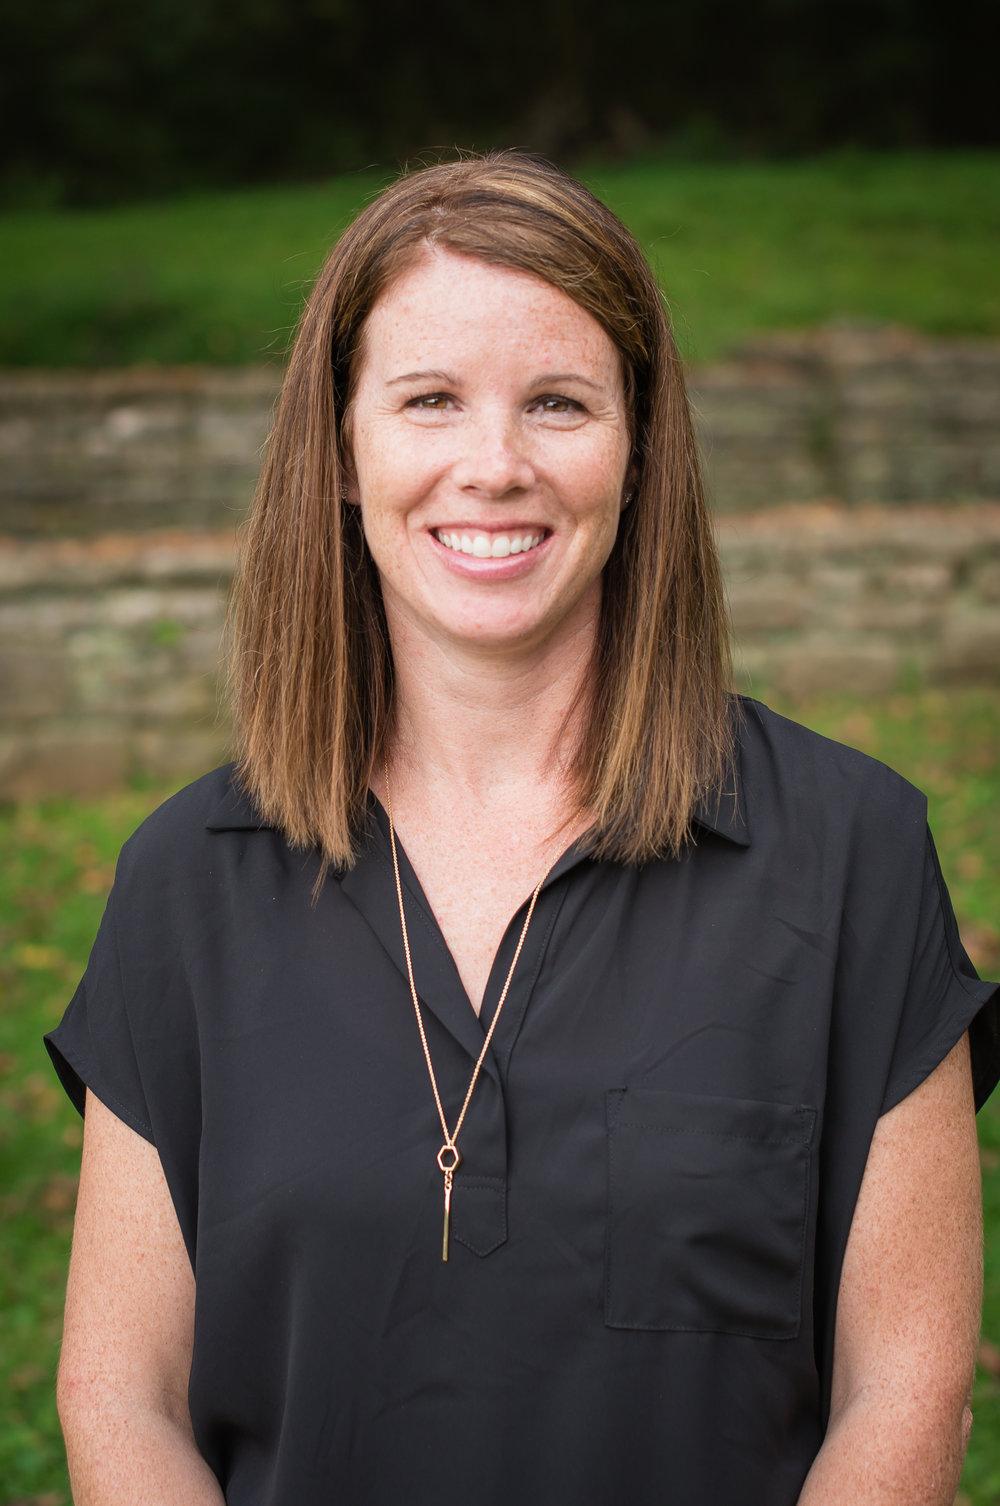 Robin Pomeroy  Dental hygienist, 15 Years Experience  cpr certified, Dental Radiology